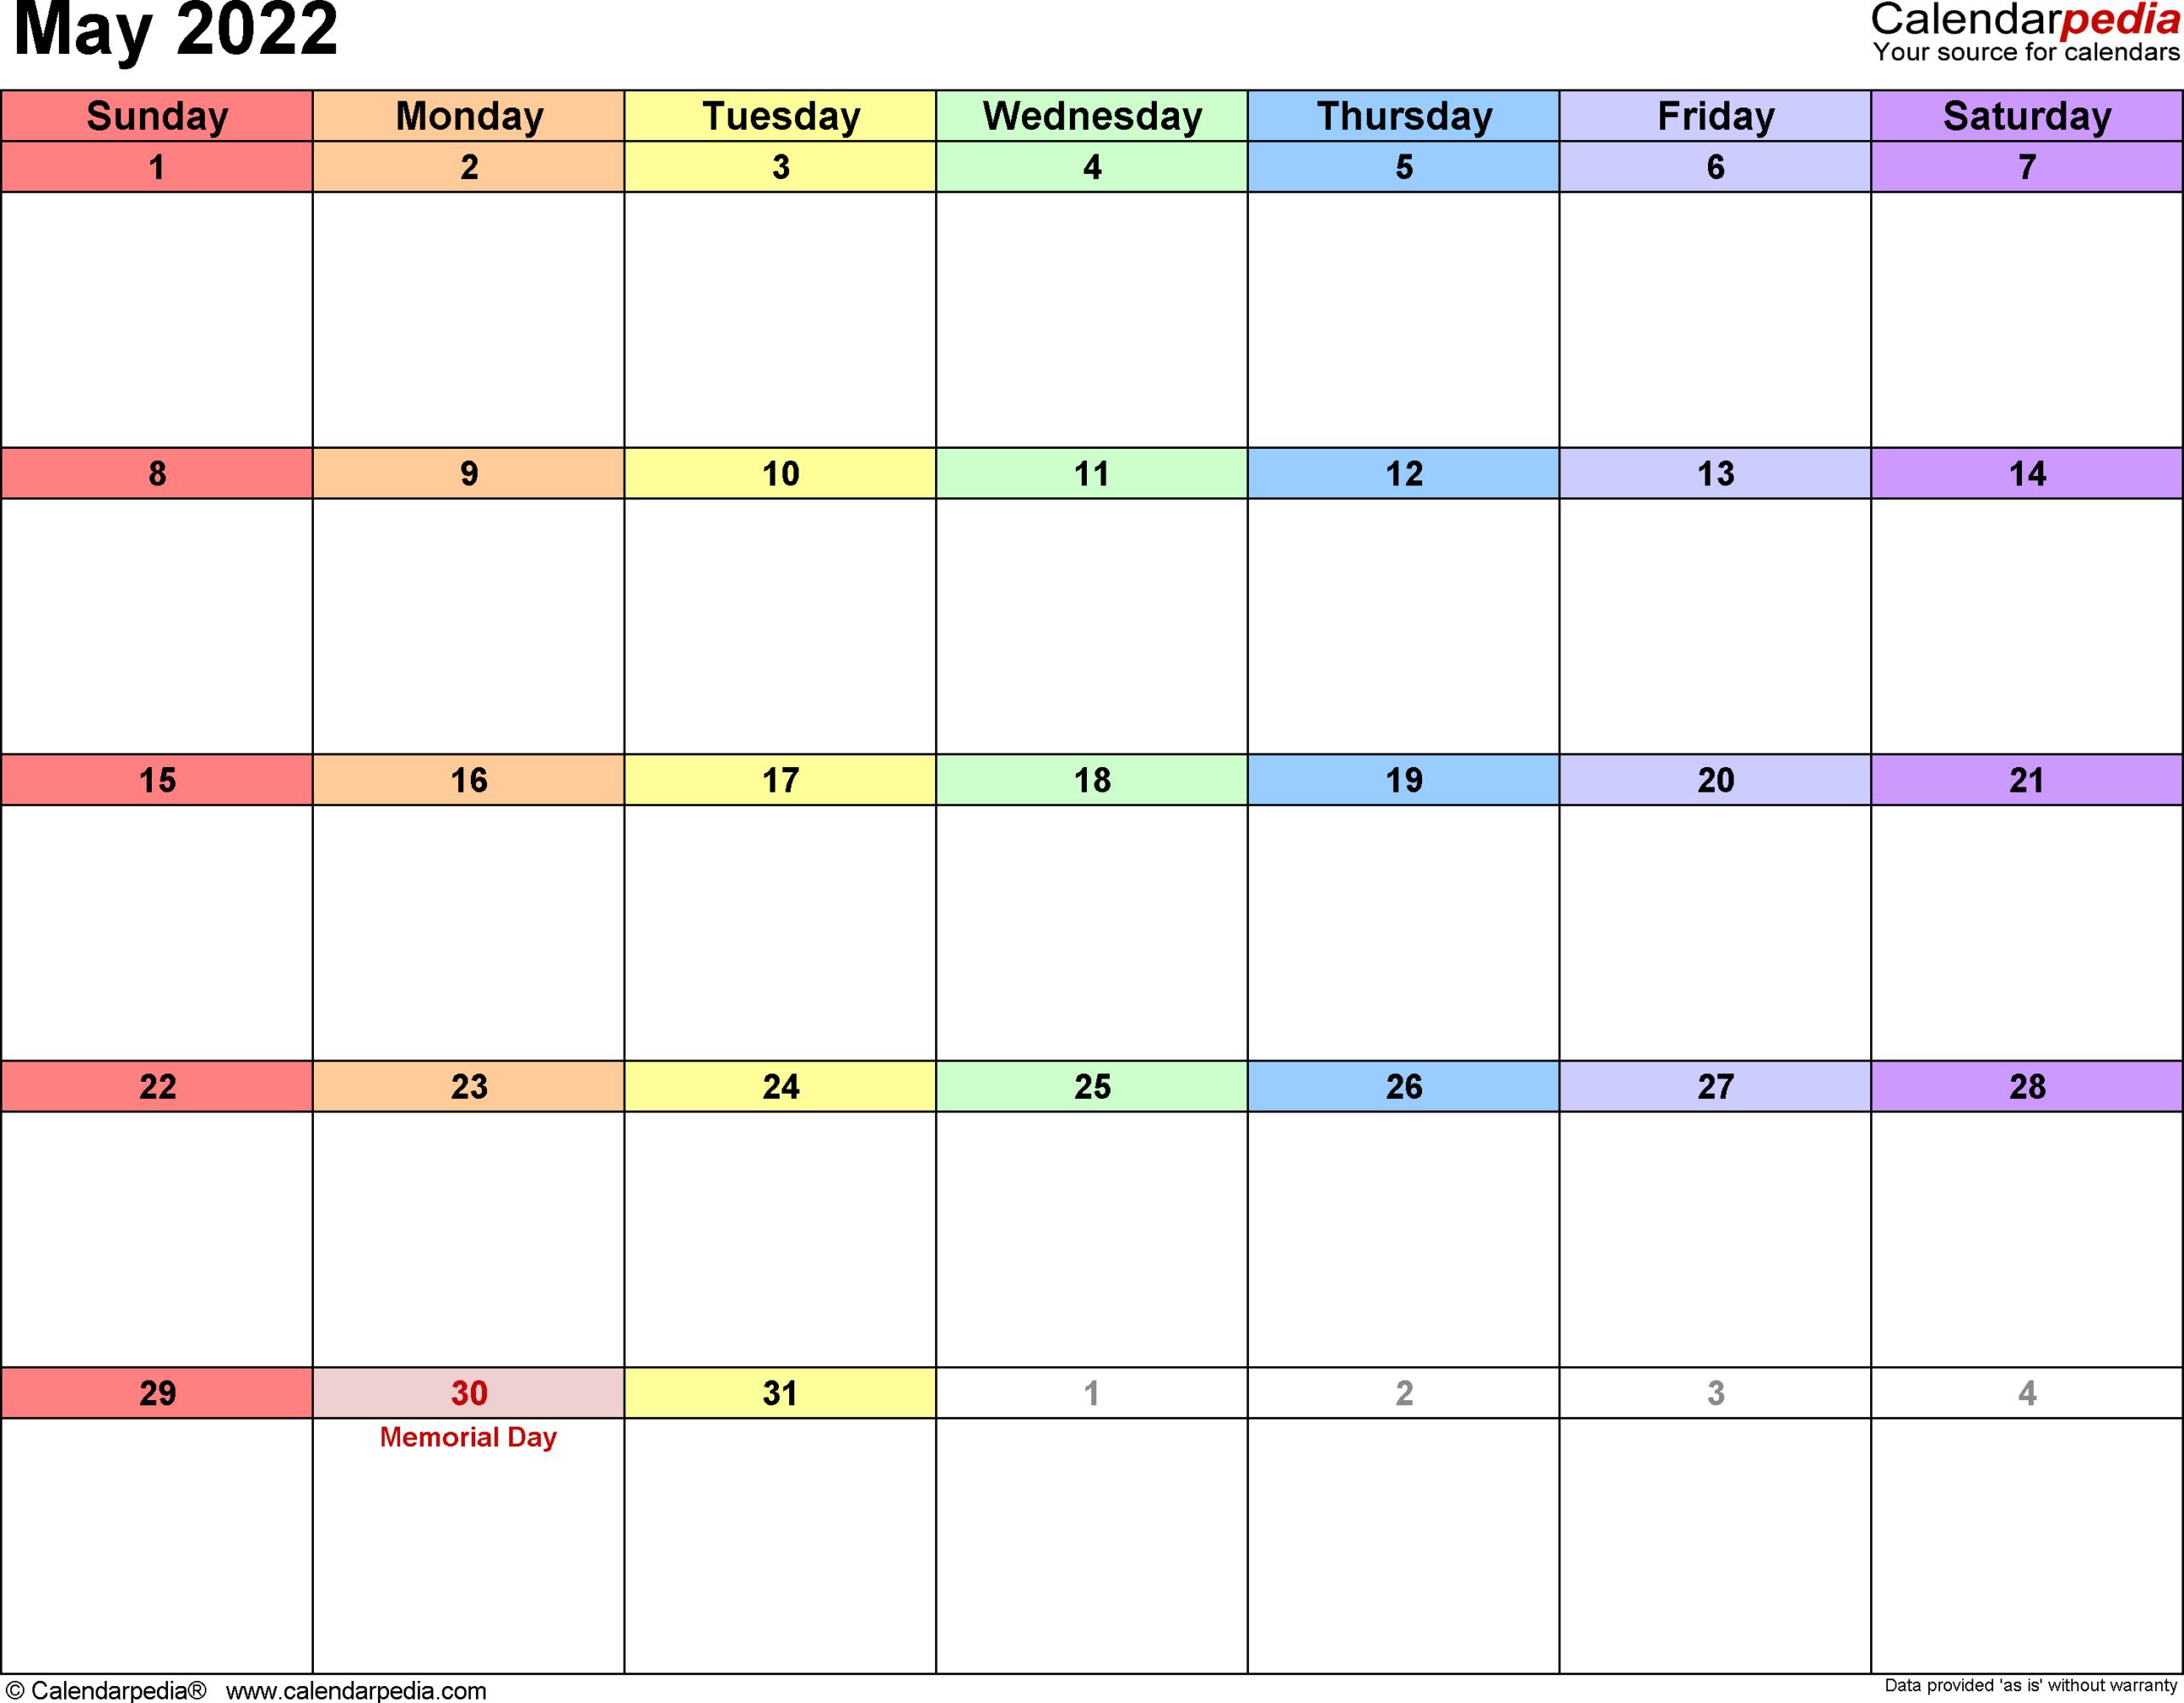 Printable Calendar May 2022 | Free Letter Templates in May 2022 Calendar Printable